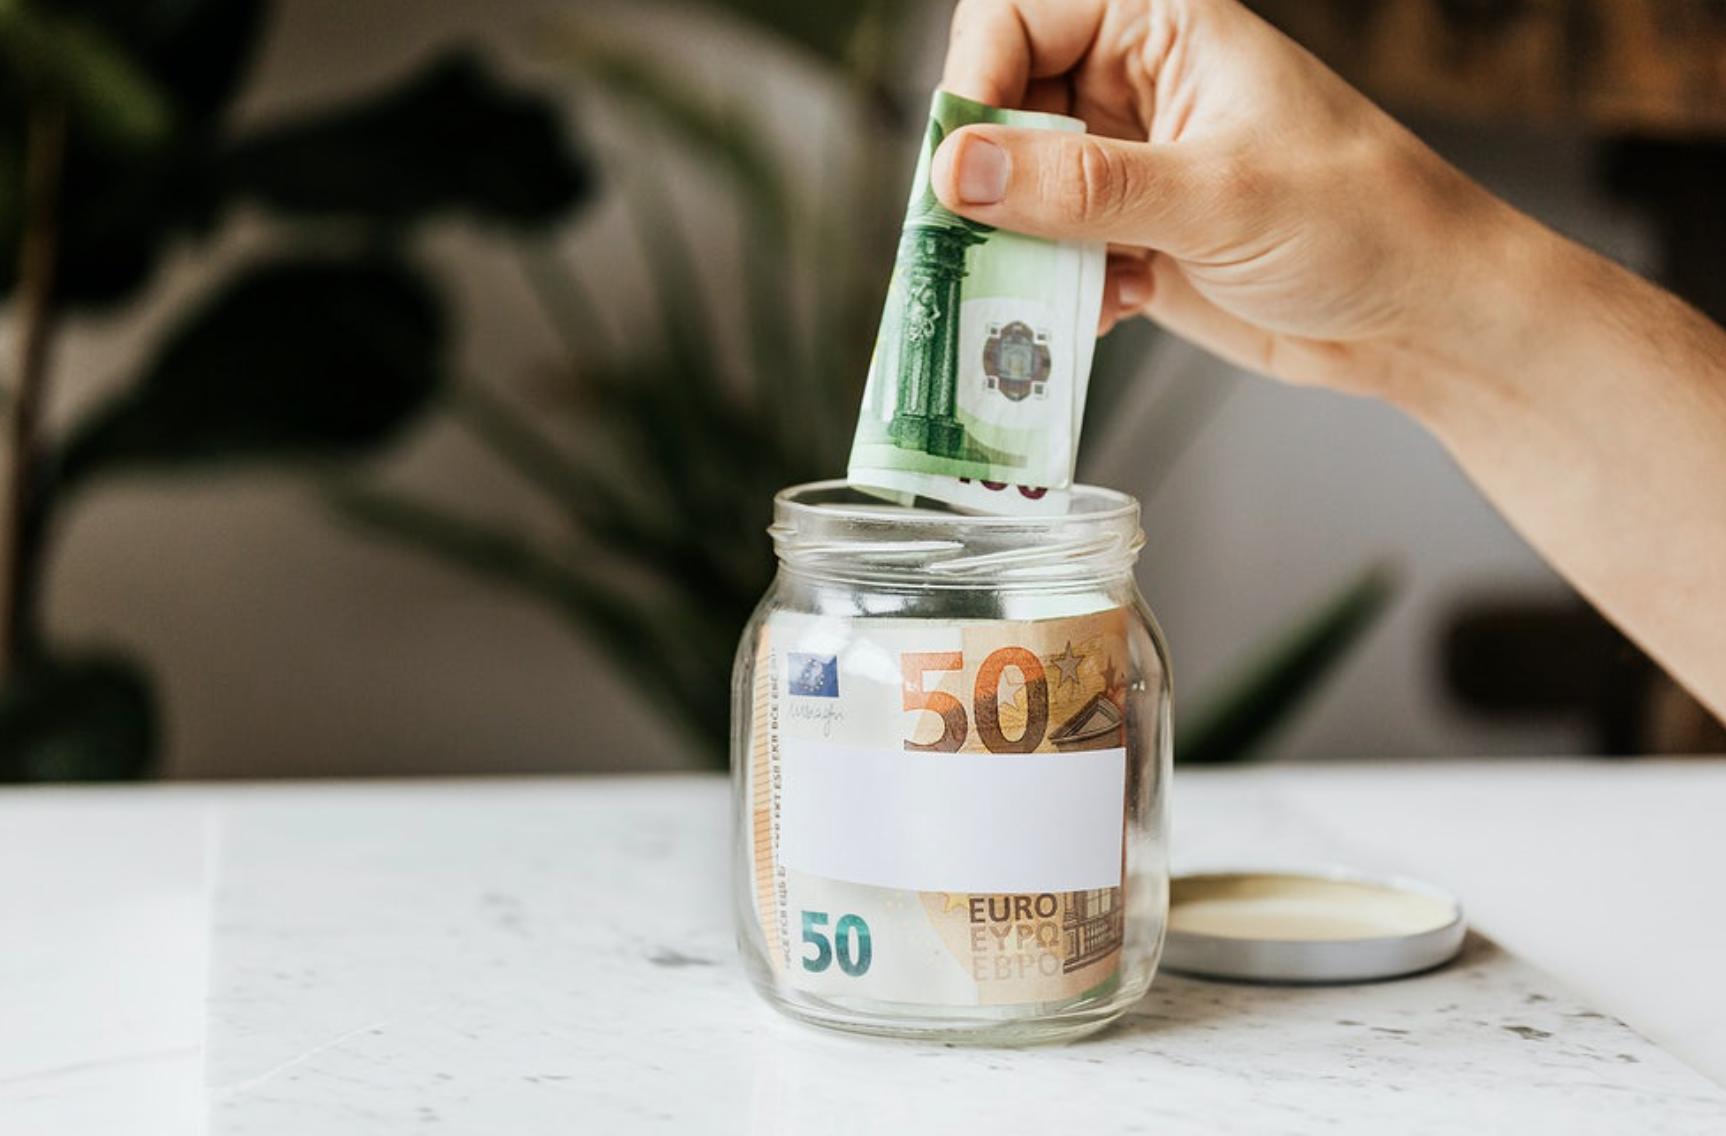 Sagsomkostninger forenklet inkasso og betalingspåkrav